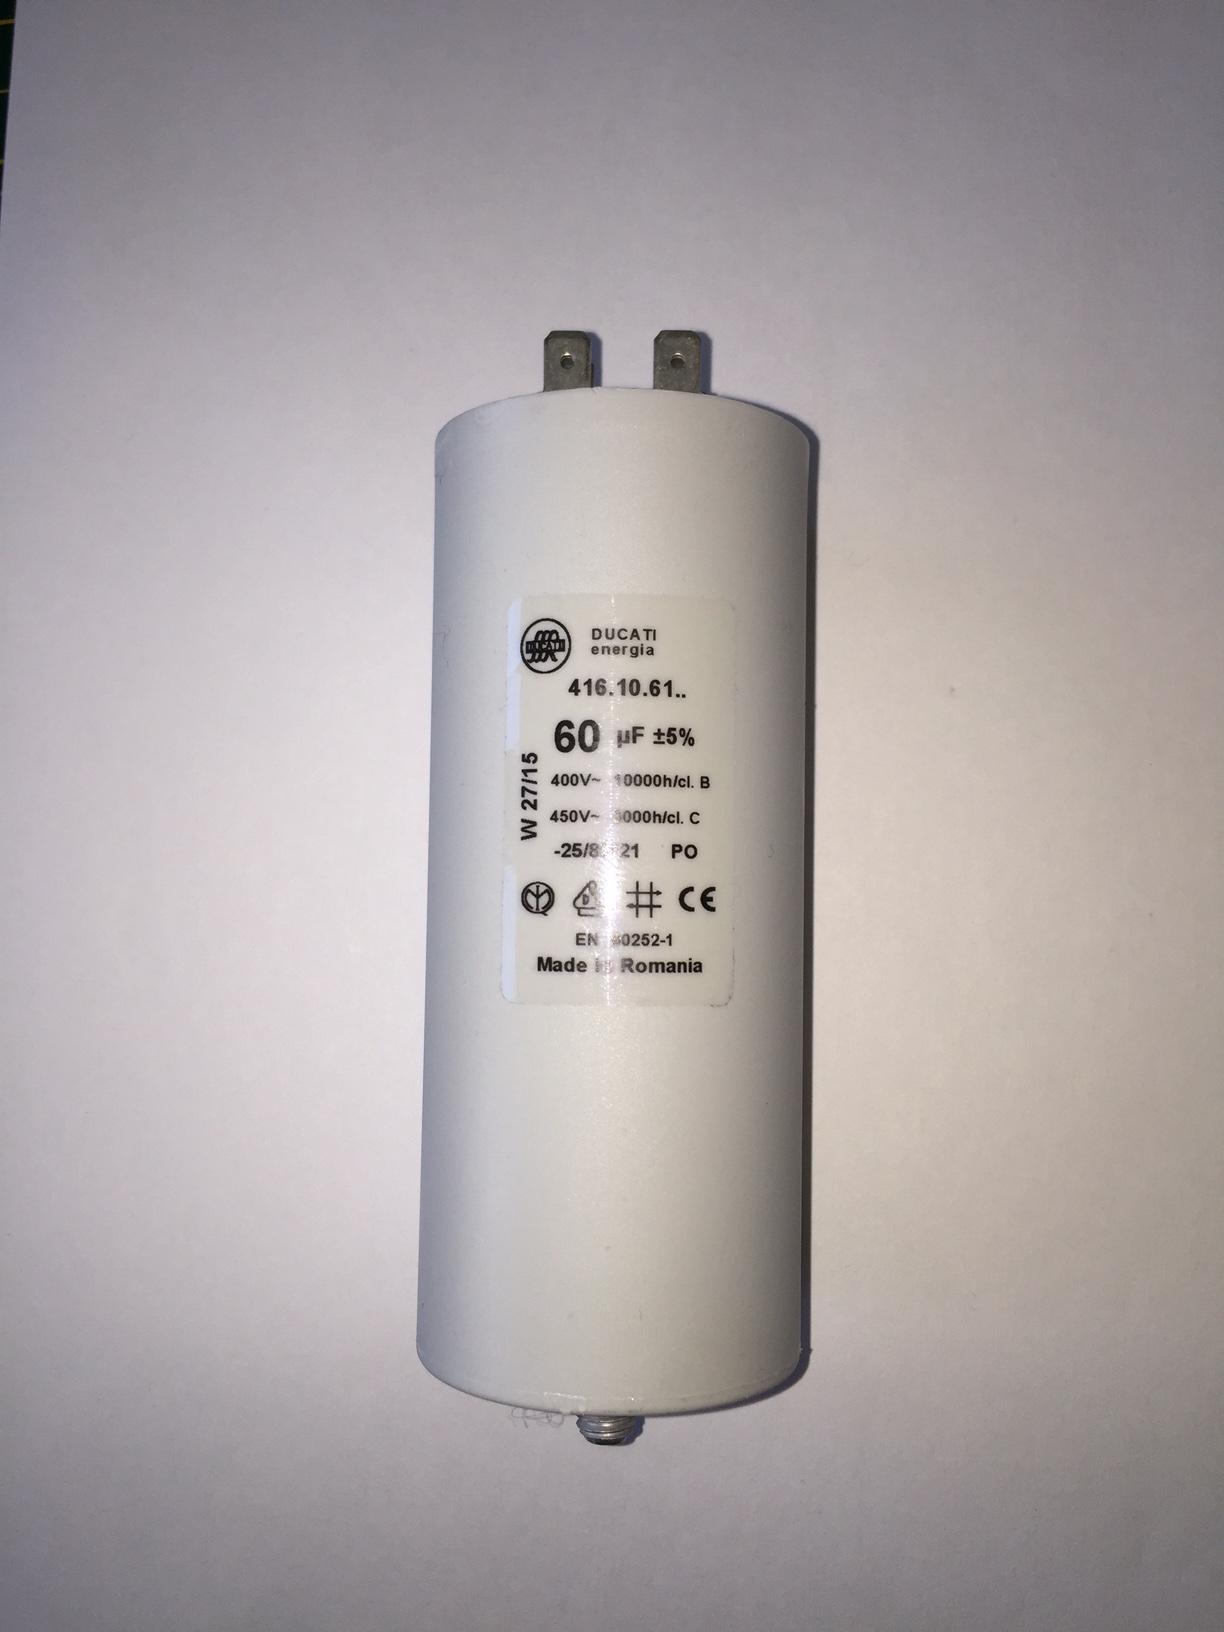 Buy motor run capacitors 60uf buy now get next day delivery for Ducati energia motor run capacitor